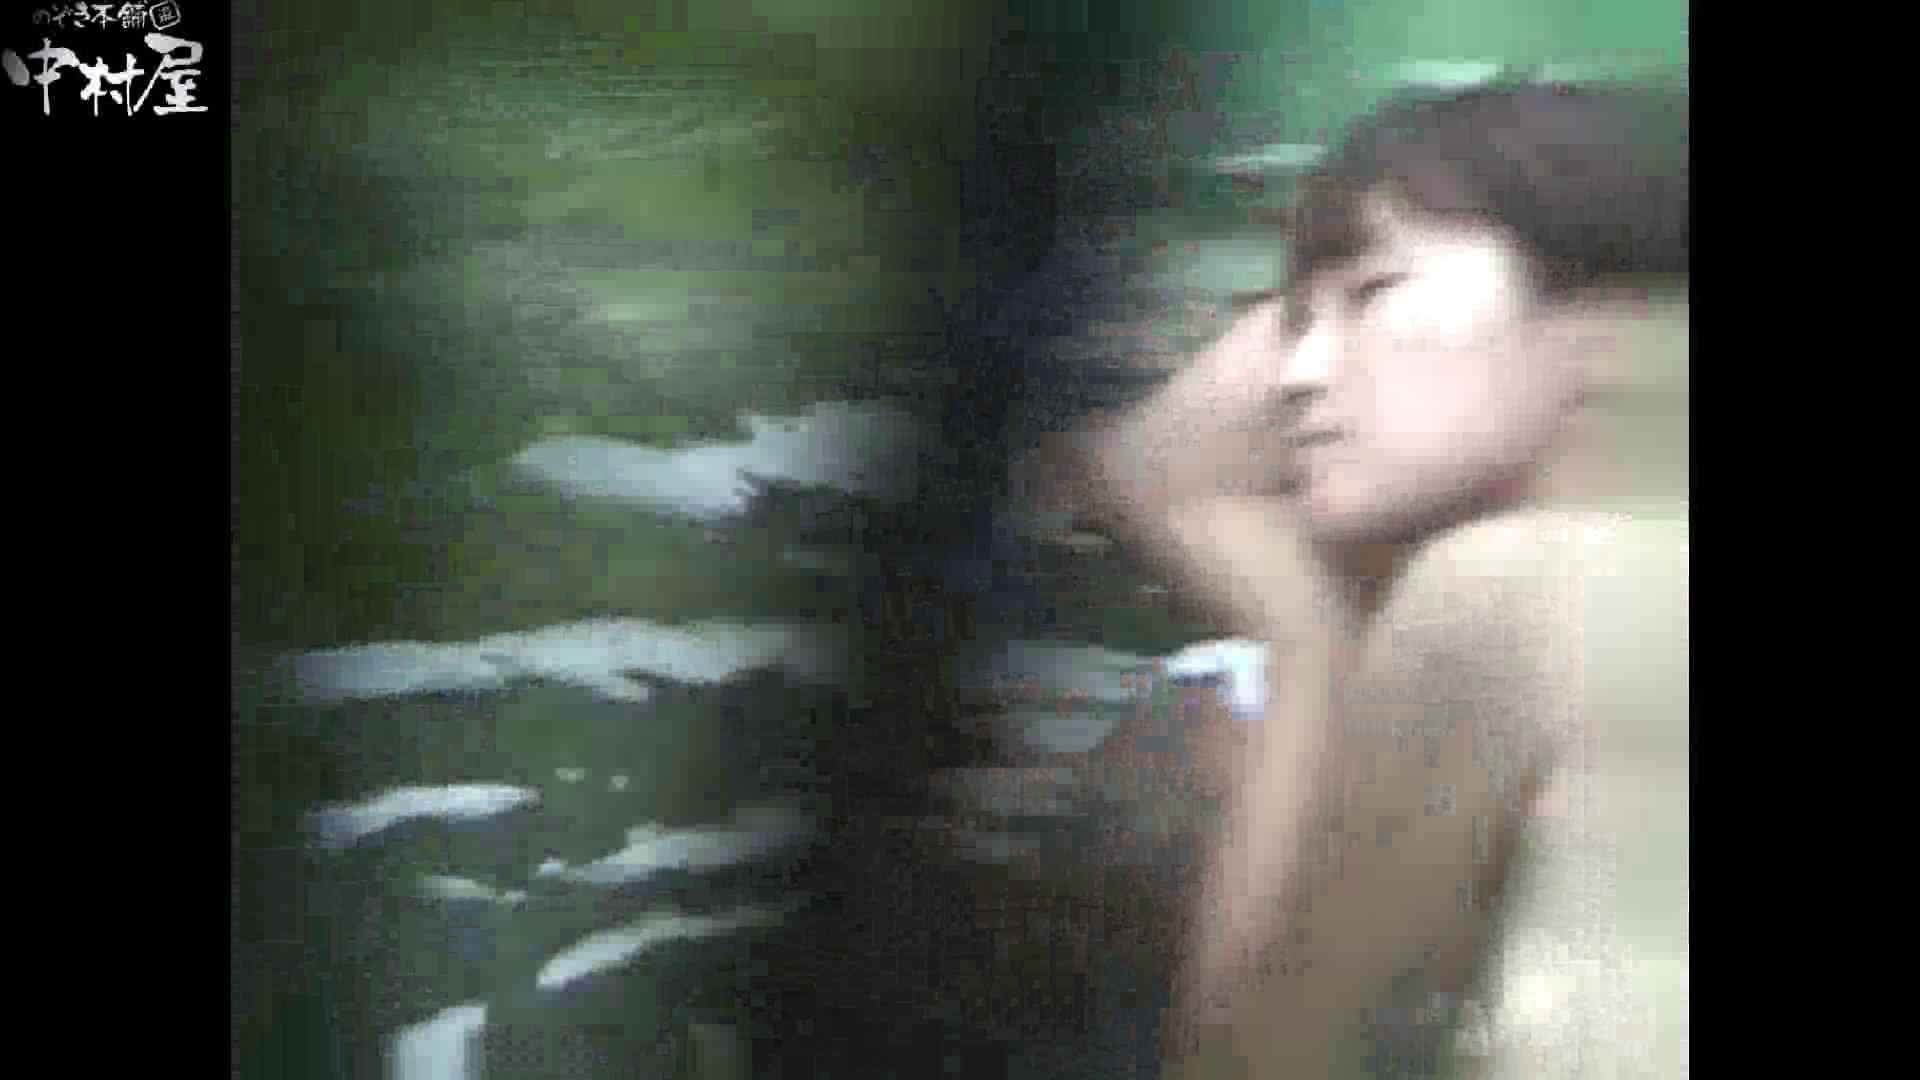 Aquaな露天風呂Vol.867潜入盗撮露天風呂参判湯 其の一 盗撮 | 潜入シリーズ  88pic 74